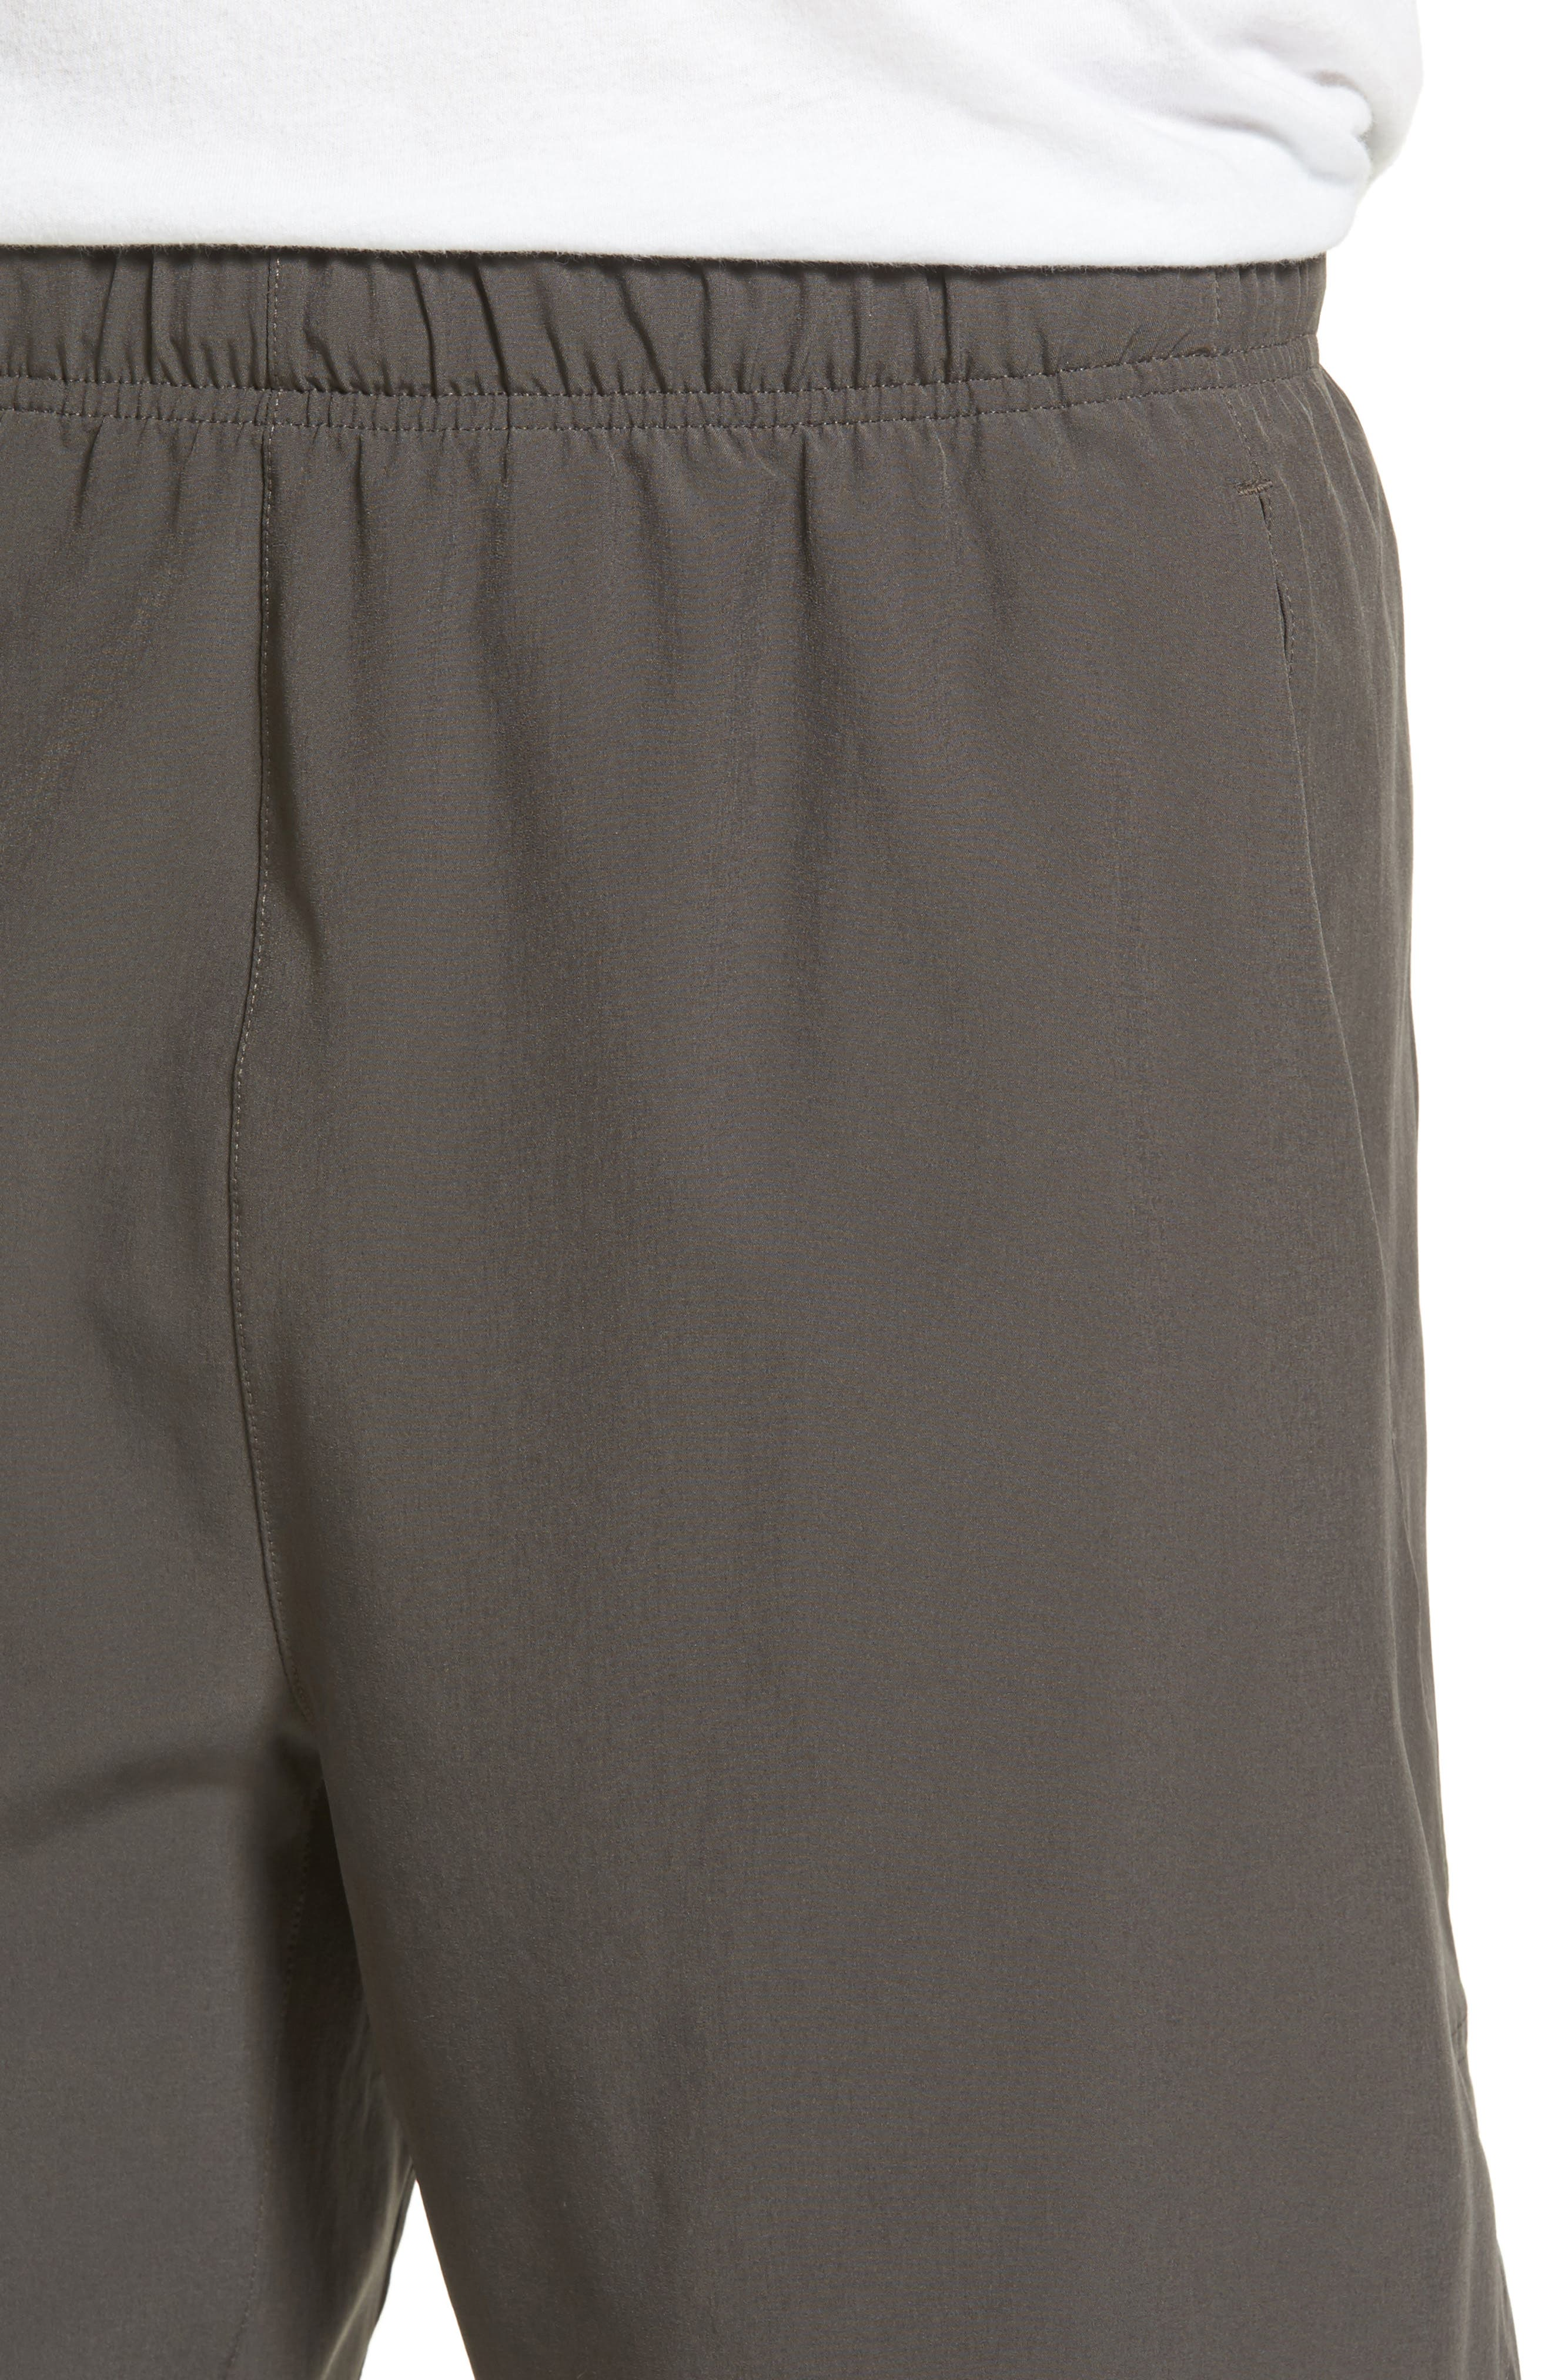 Flex Training Shorts,                             Alternate thumbnail 8, color,